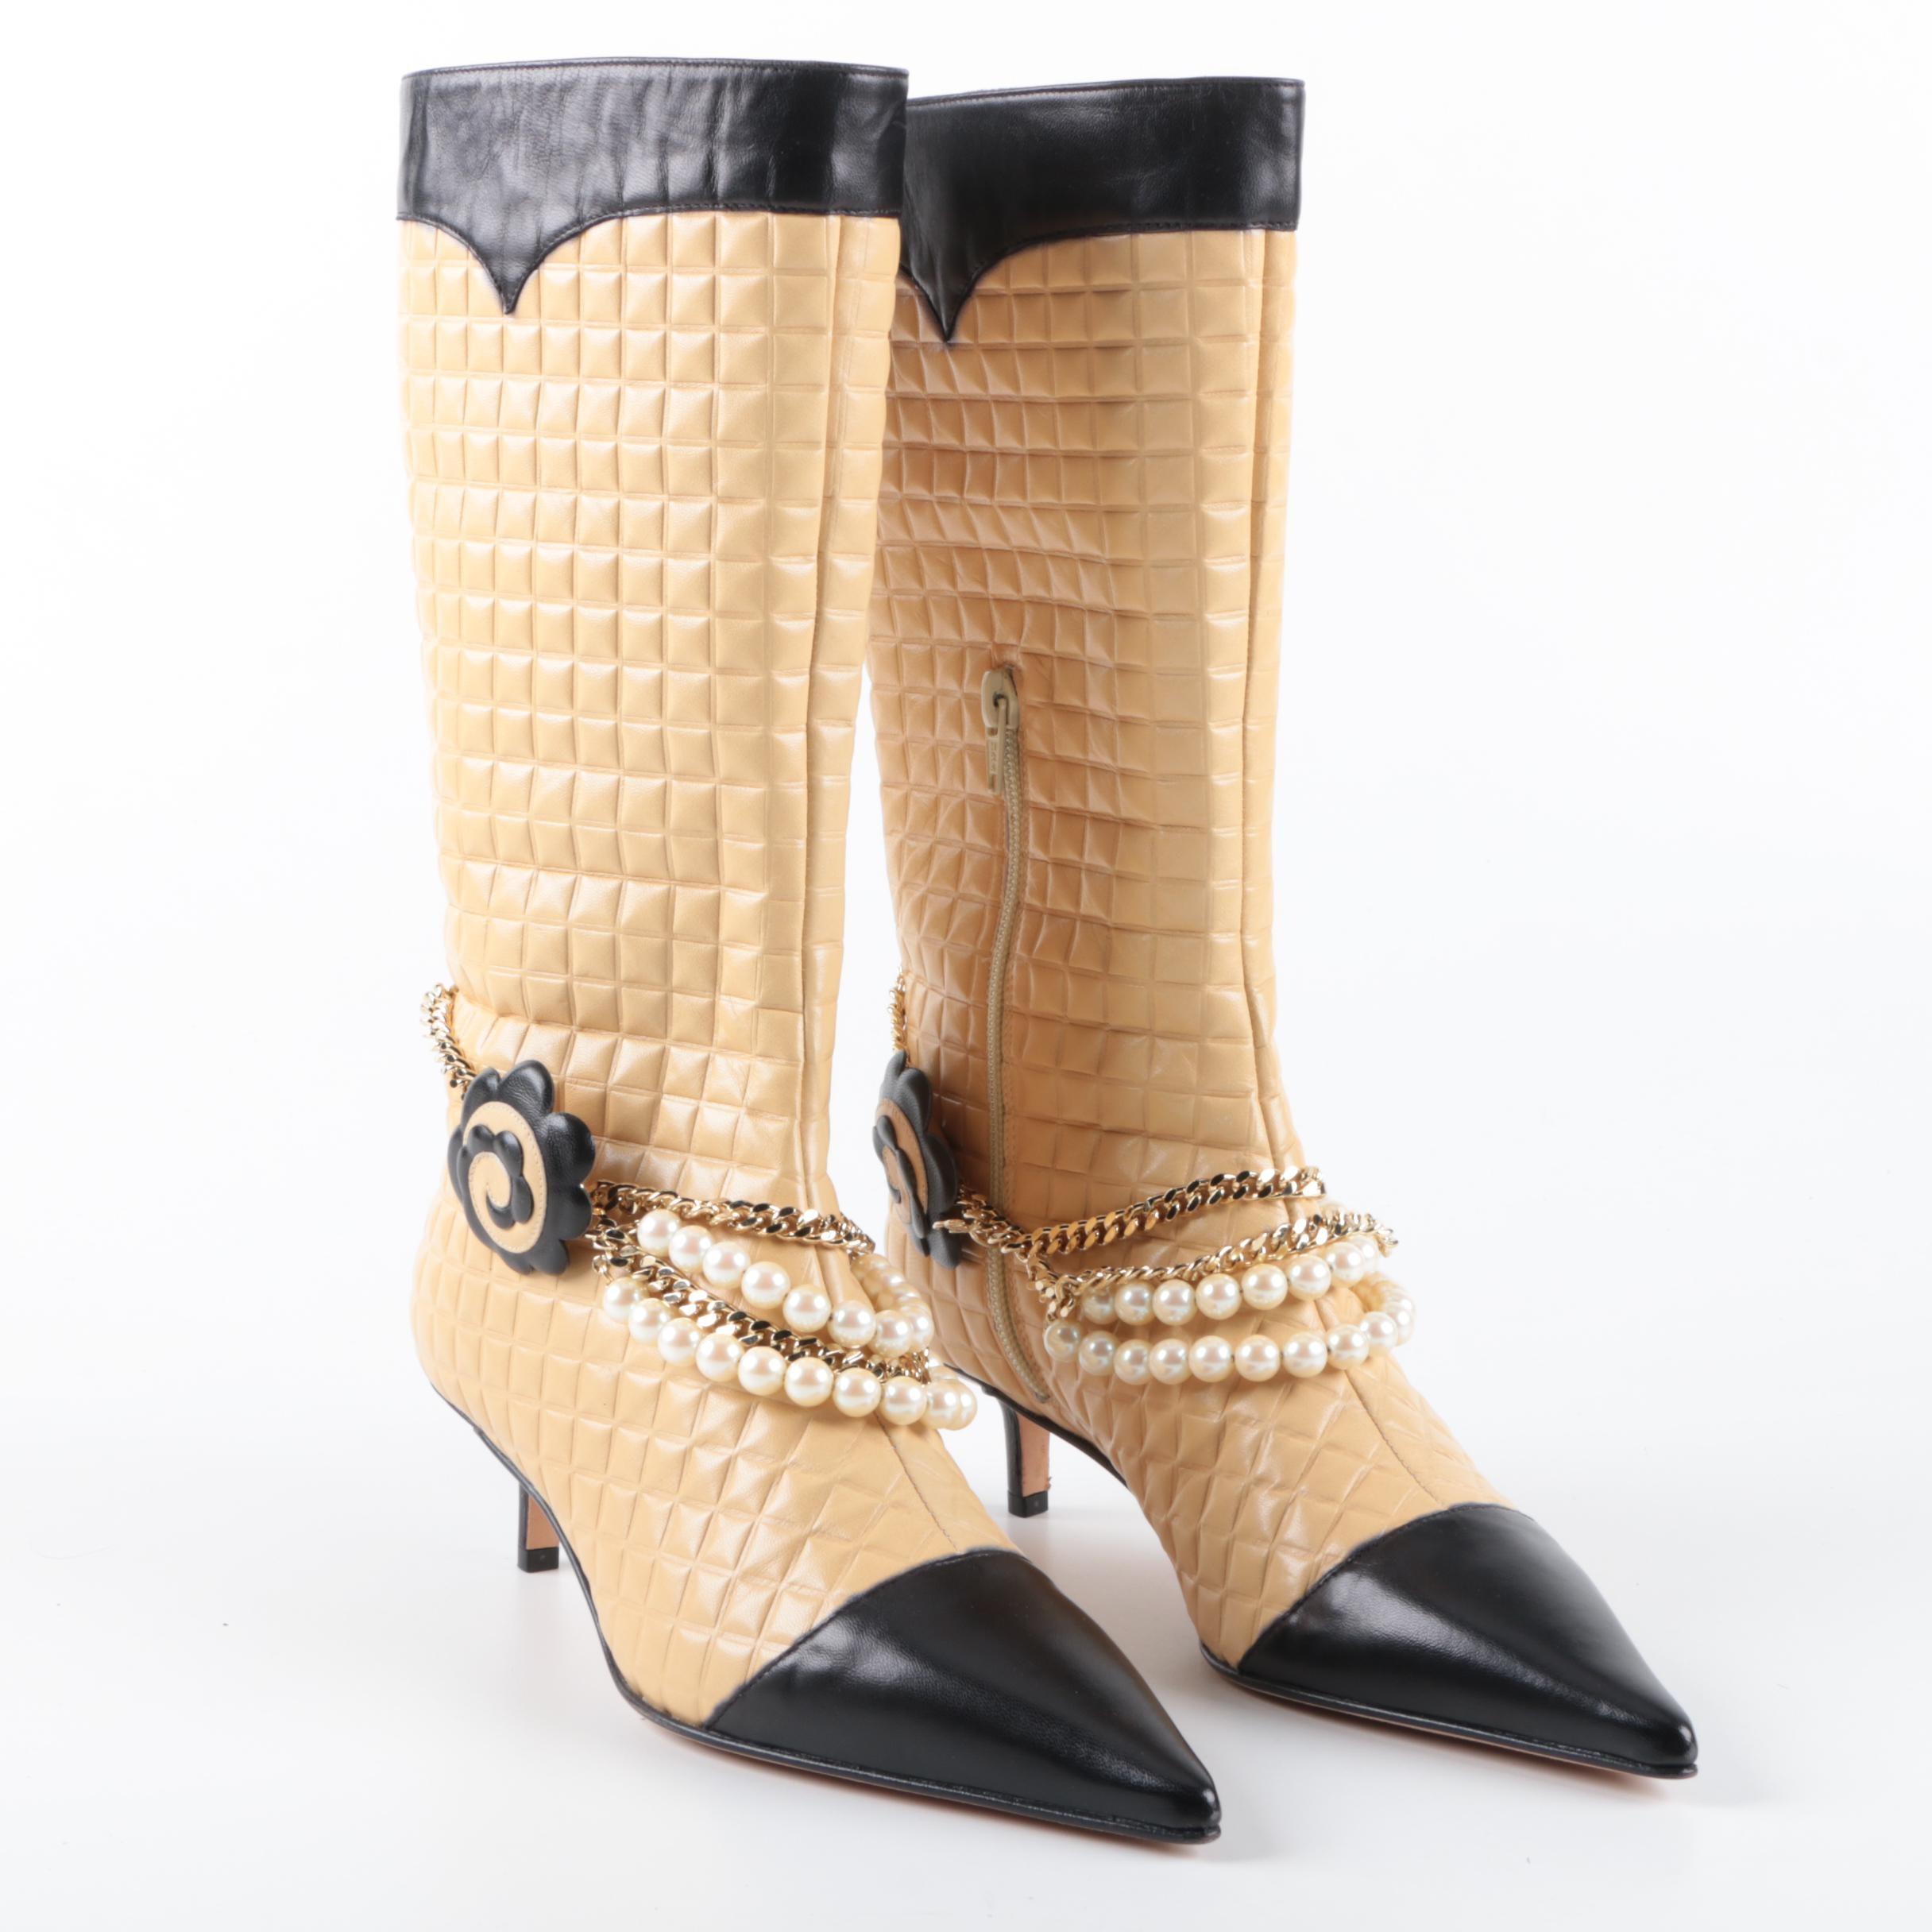 Chanel Camelia Chain CC Boots